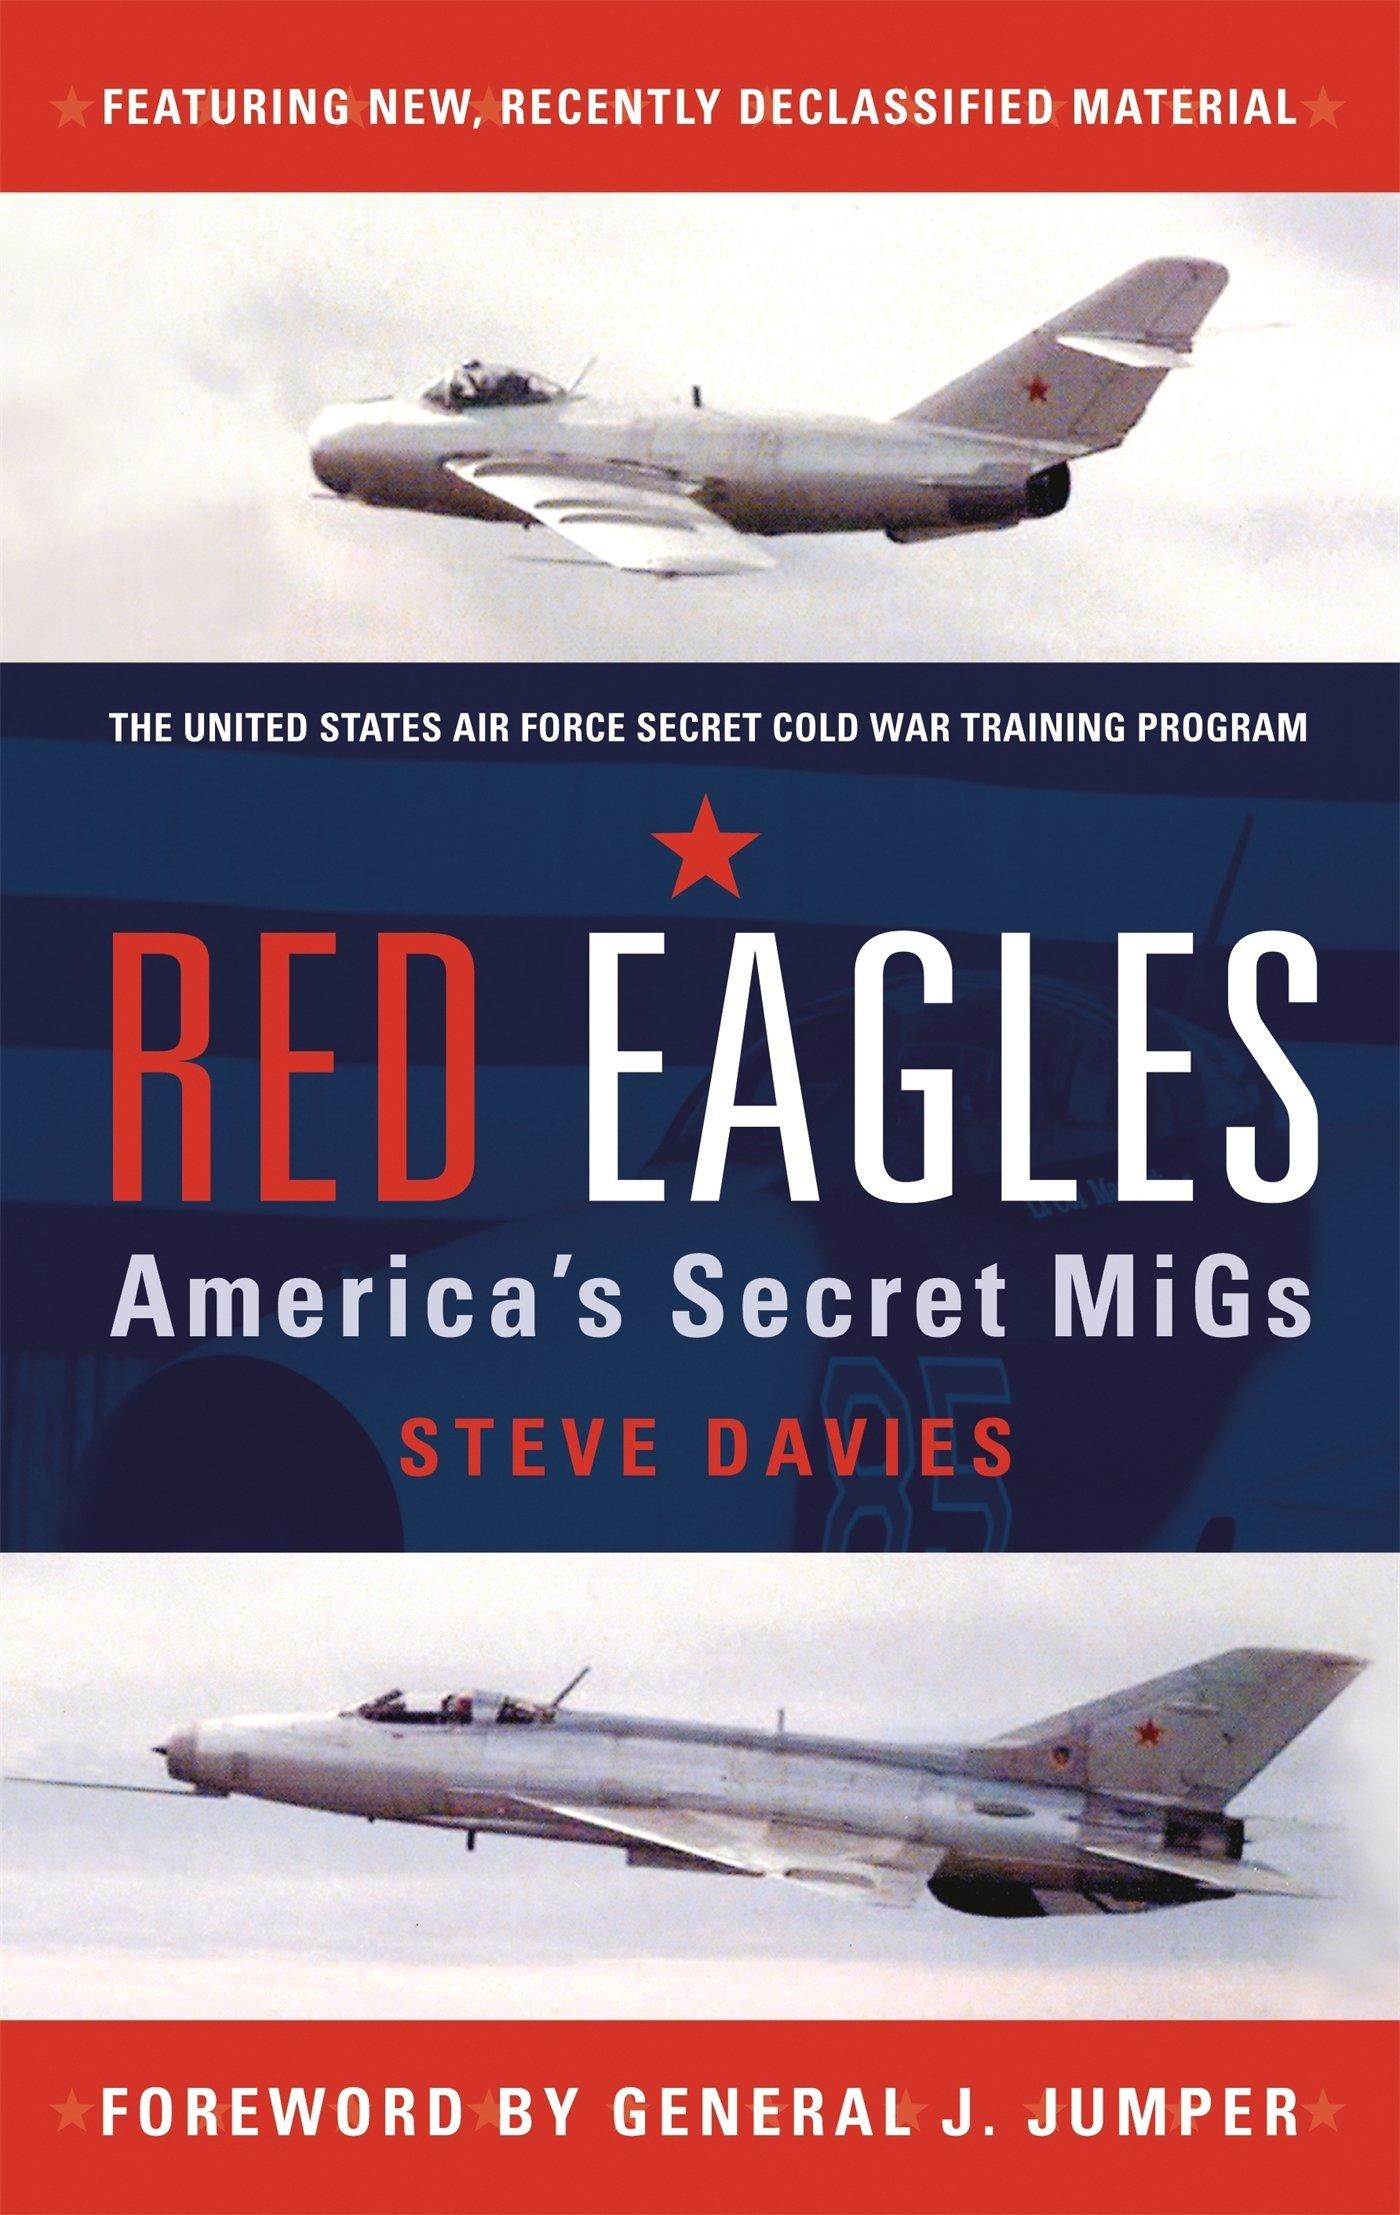 Red Eagles: America's Secret MiGs (General Aviation): Steve Davies: 9781846039706: Amazon.com: Books